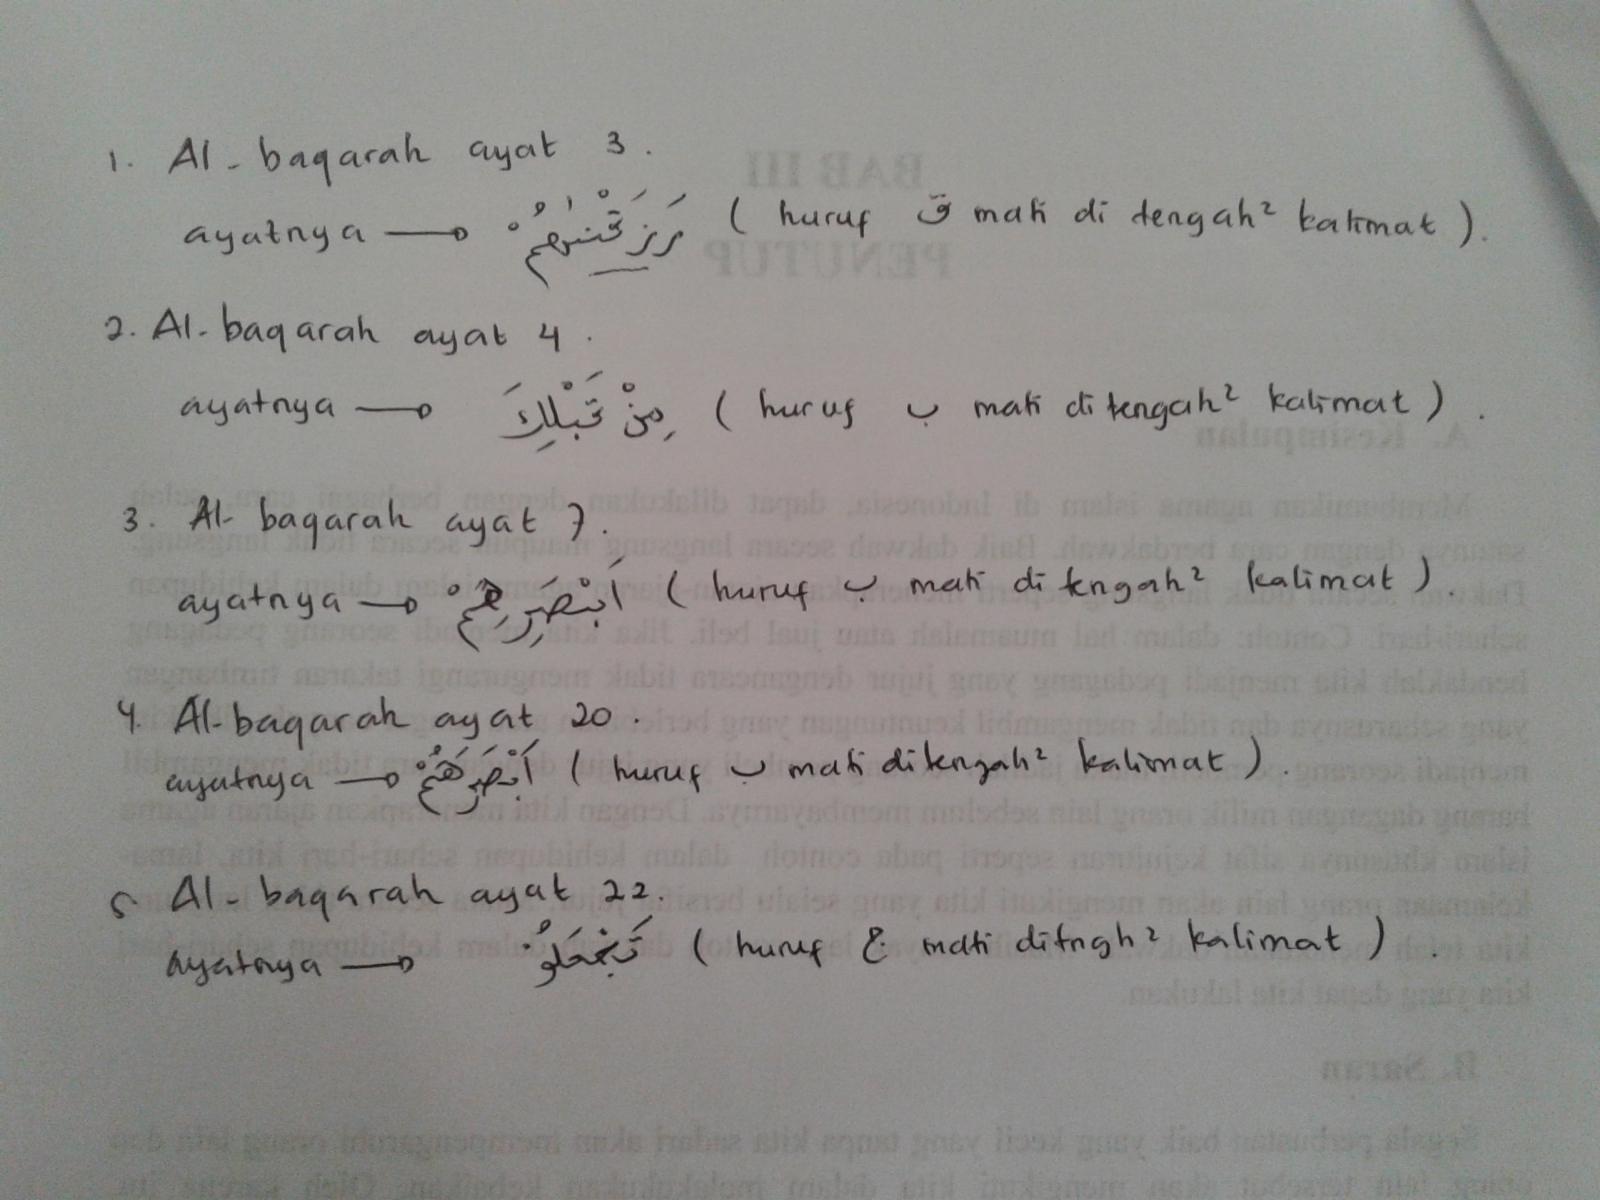 Contoh Qalqalah Sugra Dalam Al Quran : contoh, qalqalah, sugra, dalam, quran, Sebutkan, Qalqalah, Sugra, Dalam, Al-Quran, Menggunakan, Alasan., Brainly.co.id